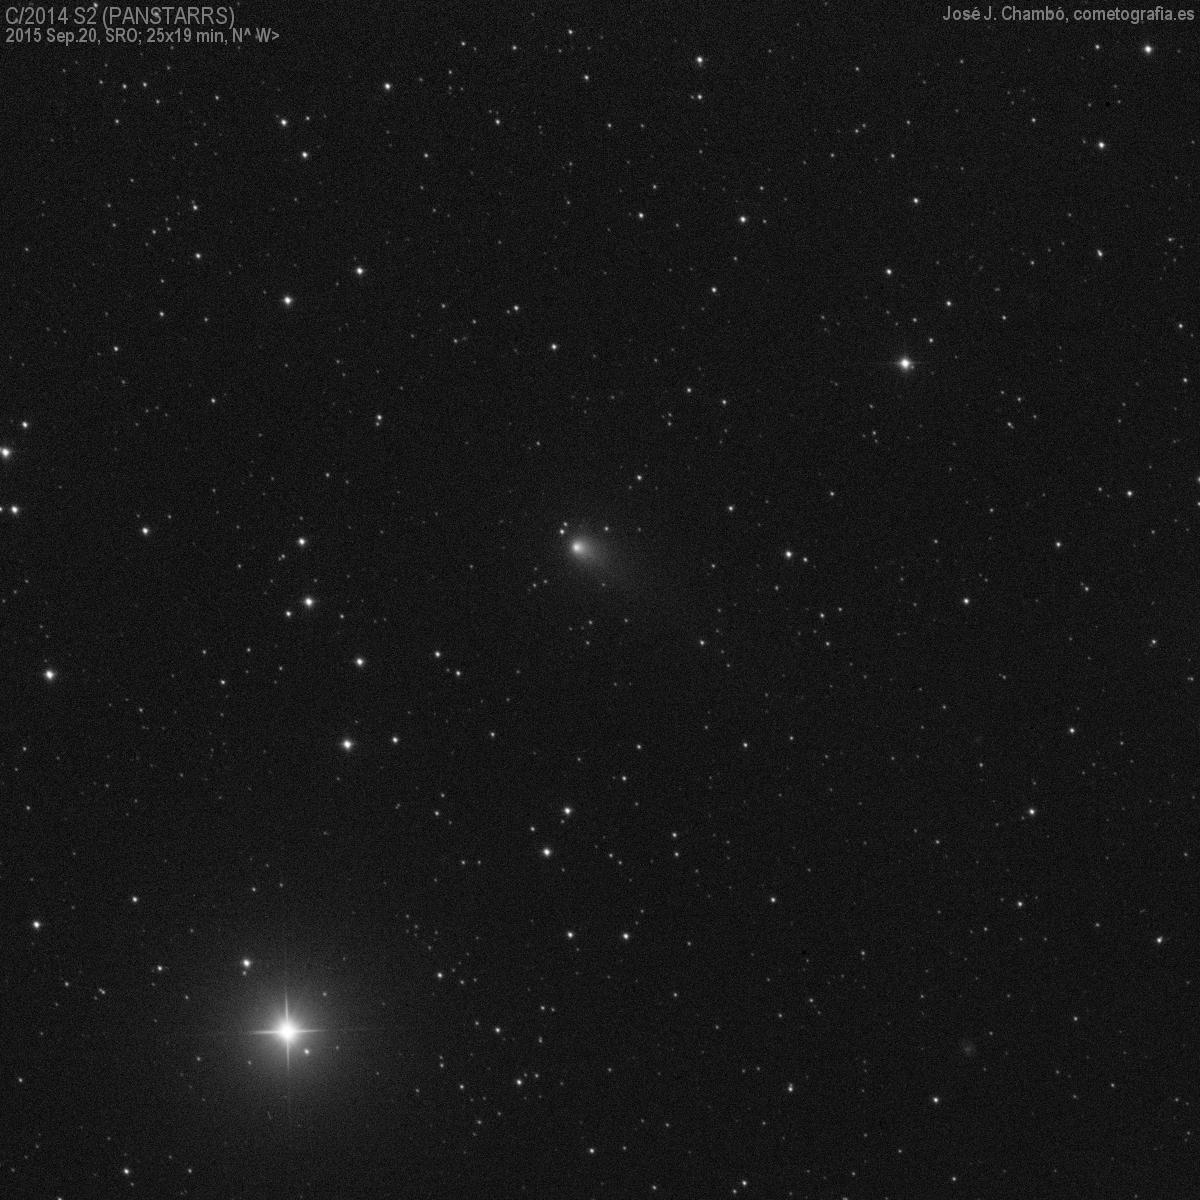 Cometa C/2014 S2 (PANSTARRS)